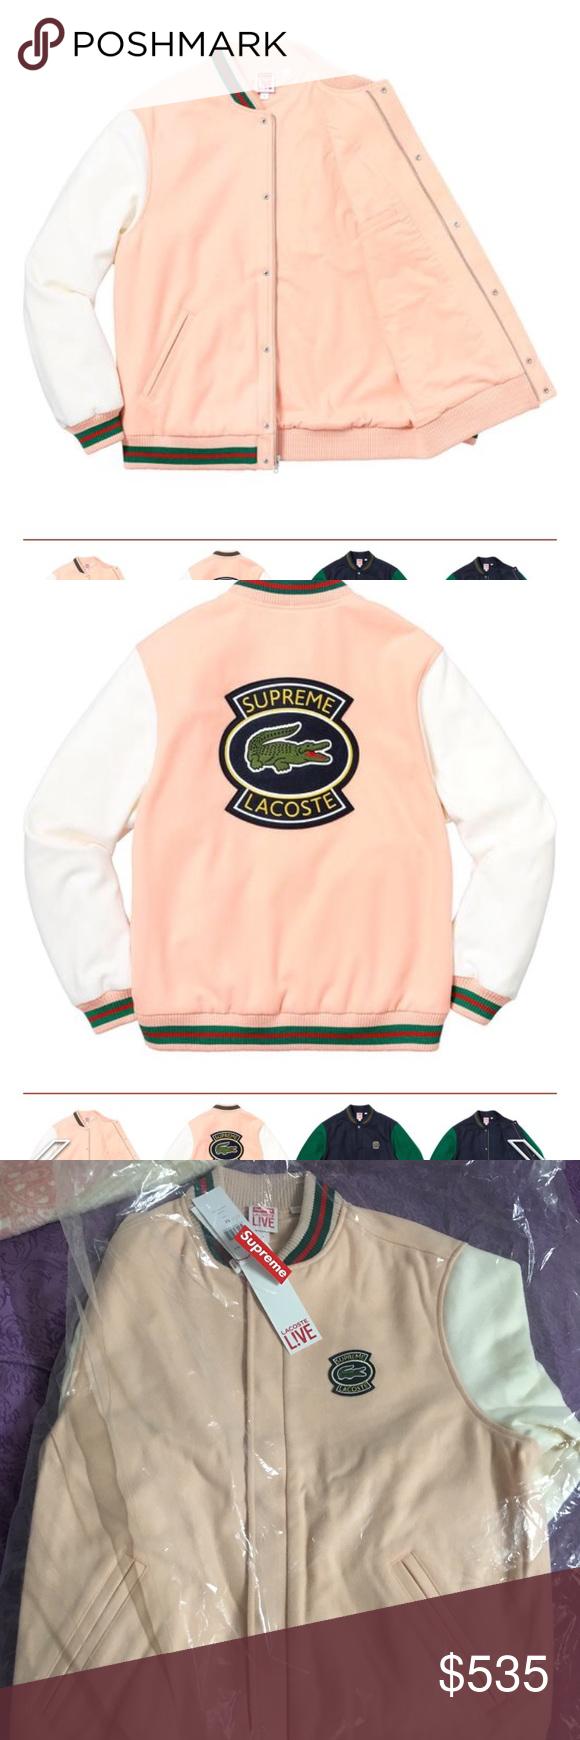 Supreme X Lacoste Wool Varsity Jacket Peach M Size Nwt My Posh